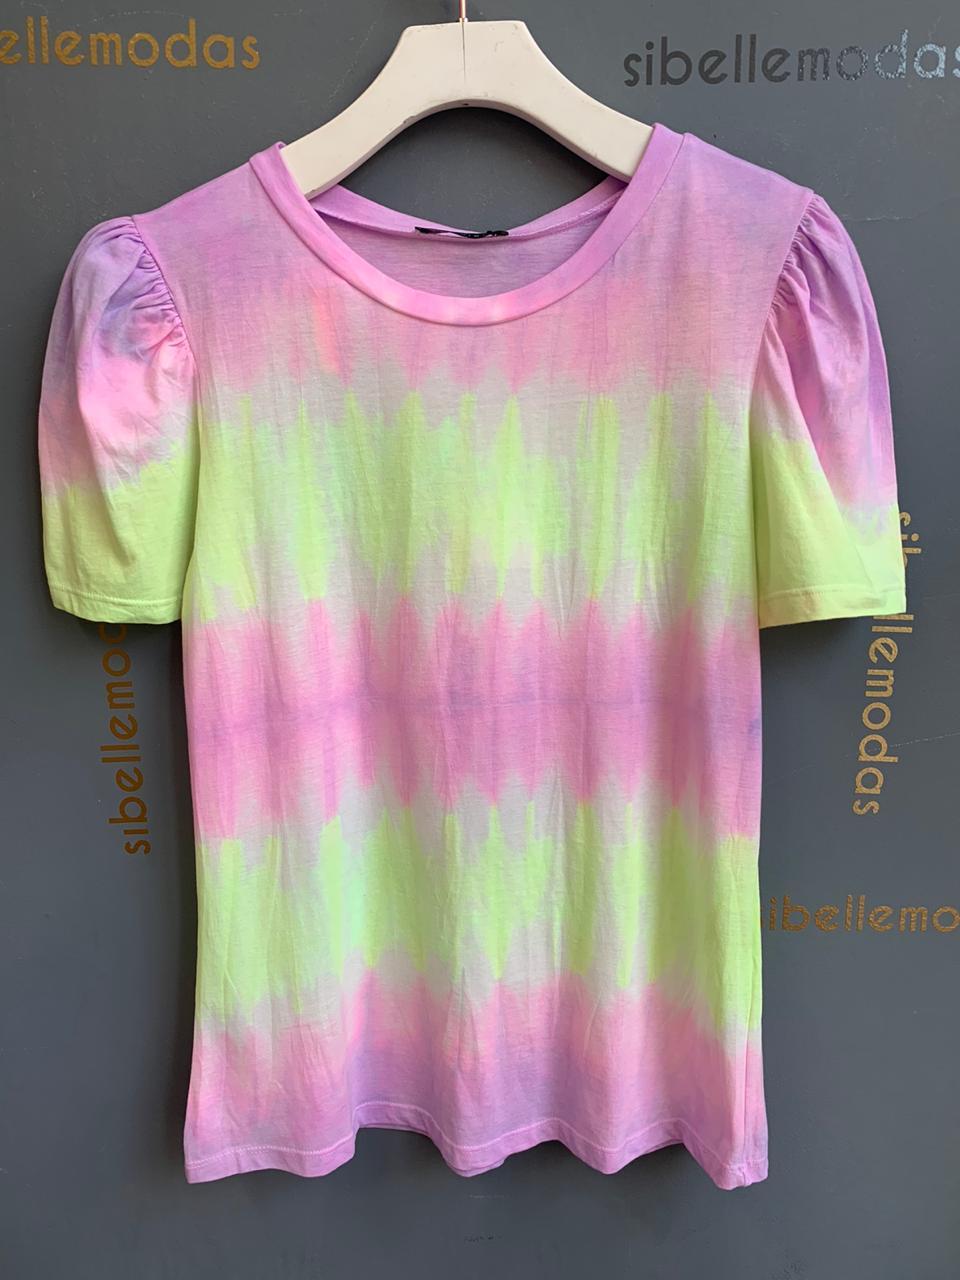 T-Shirt  La chocole  Tie Dye Manga Bufante